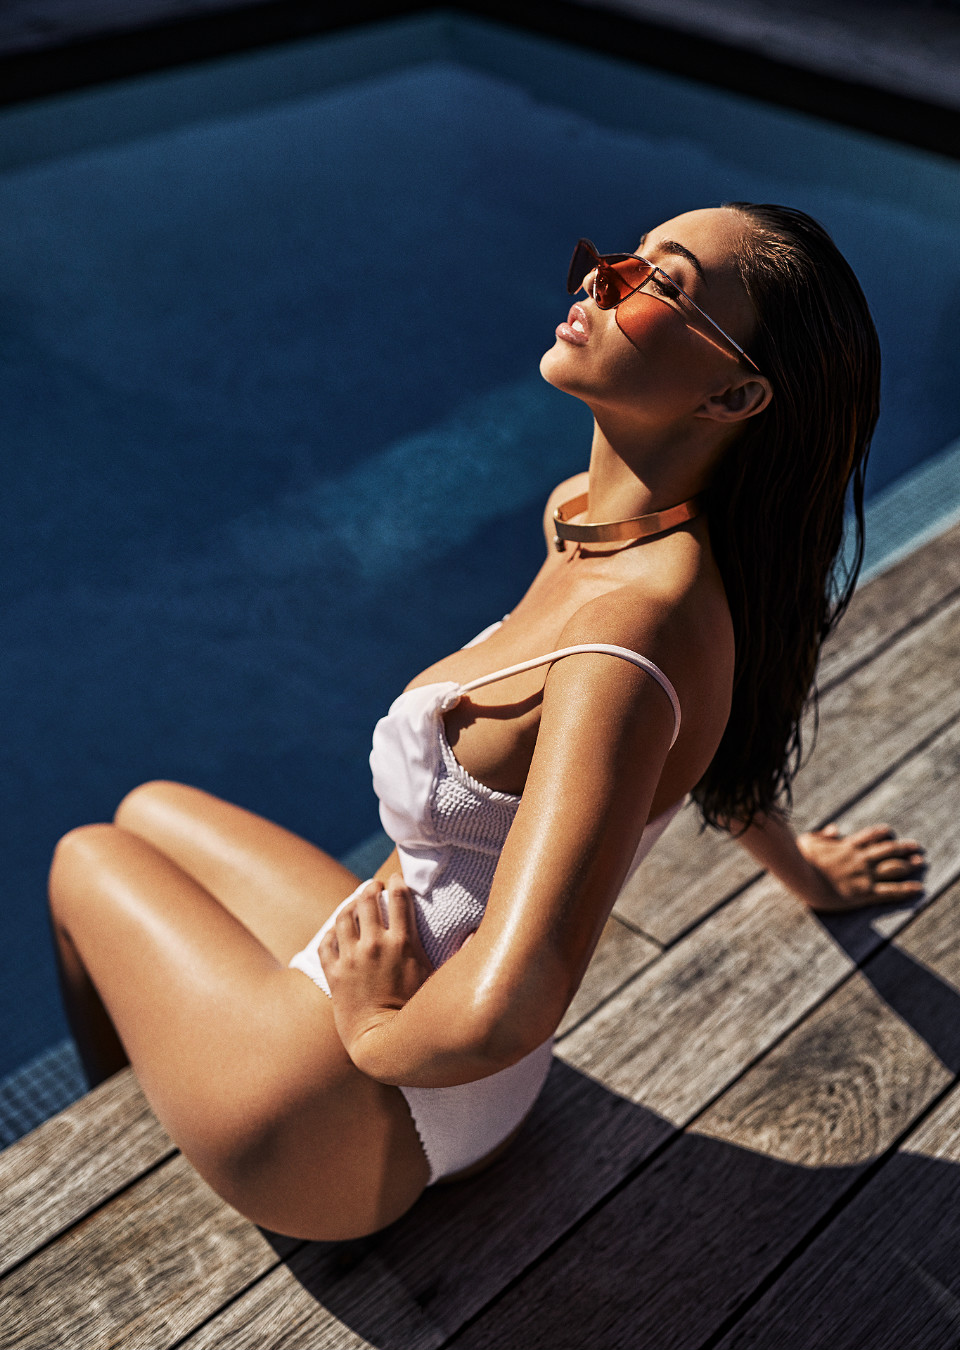 Azealia banks nude 7 photos,Kim feenstra 2019 XXX pics Rachel Mortenson,Emma Stone Shows Her Breasts On Video